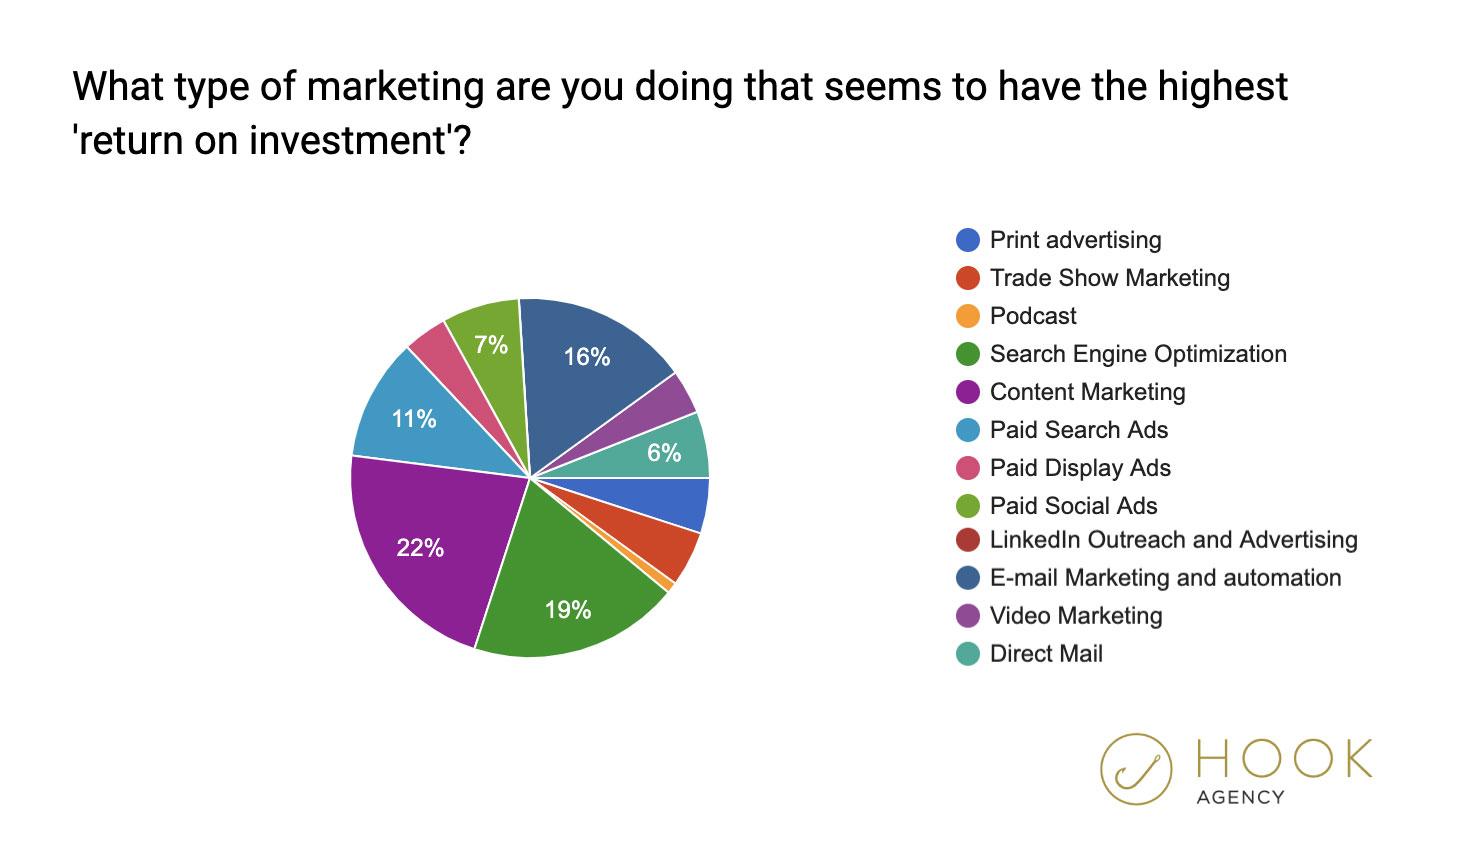 2020 Marketing Statistics - Return on Investment